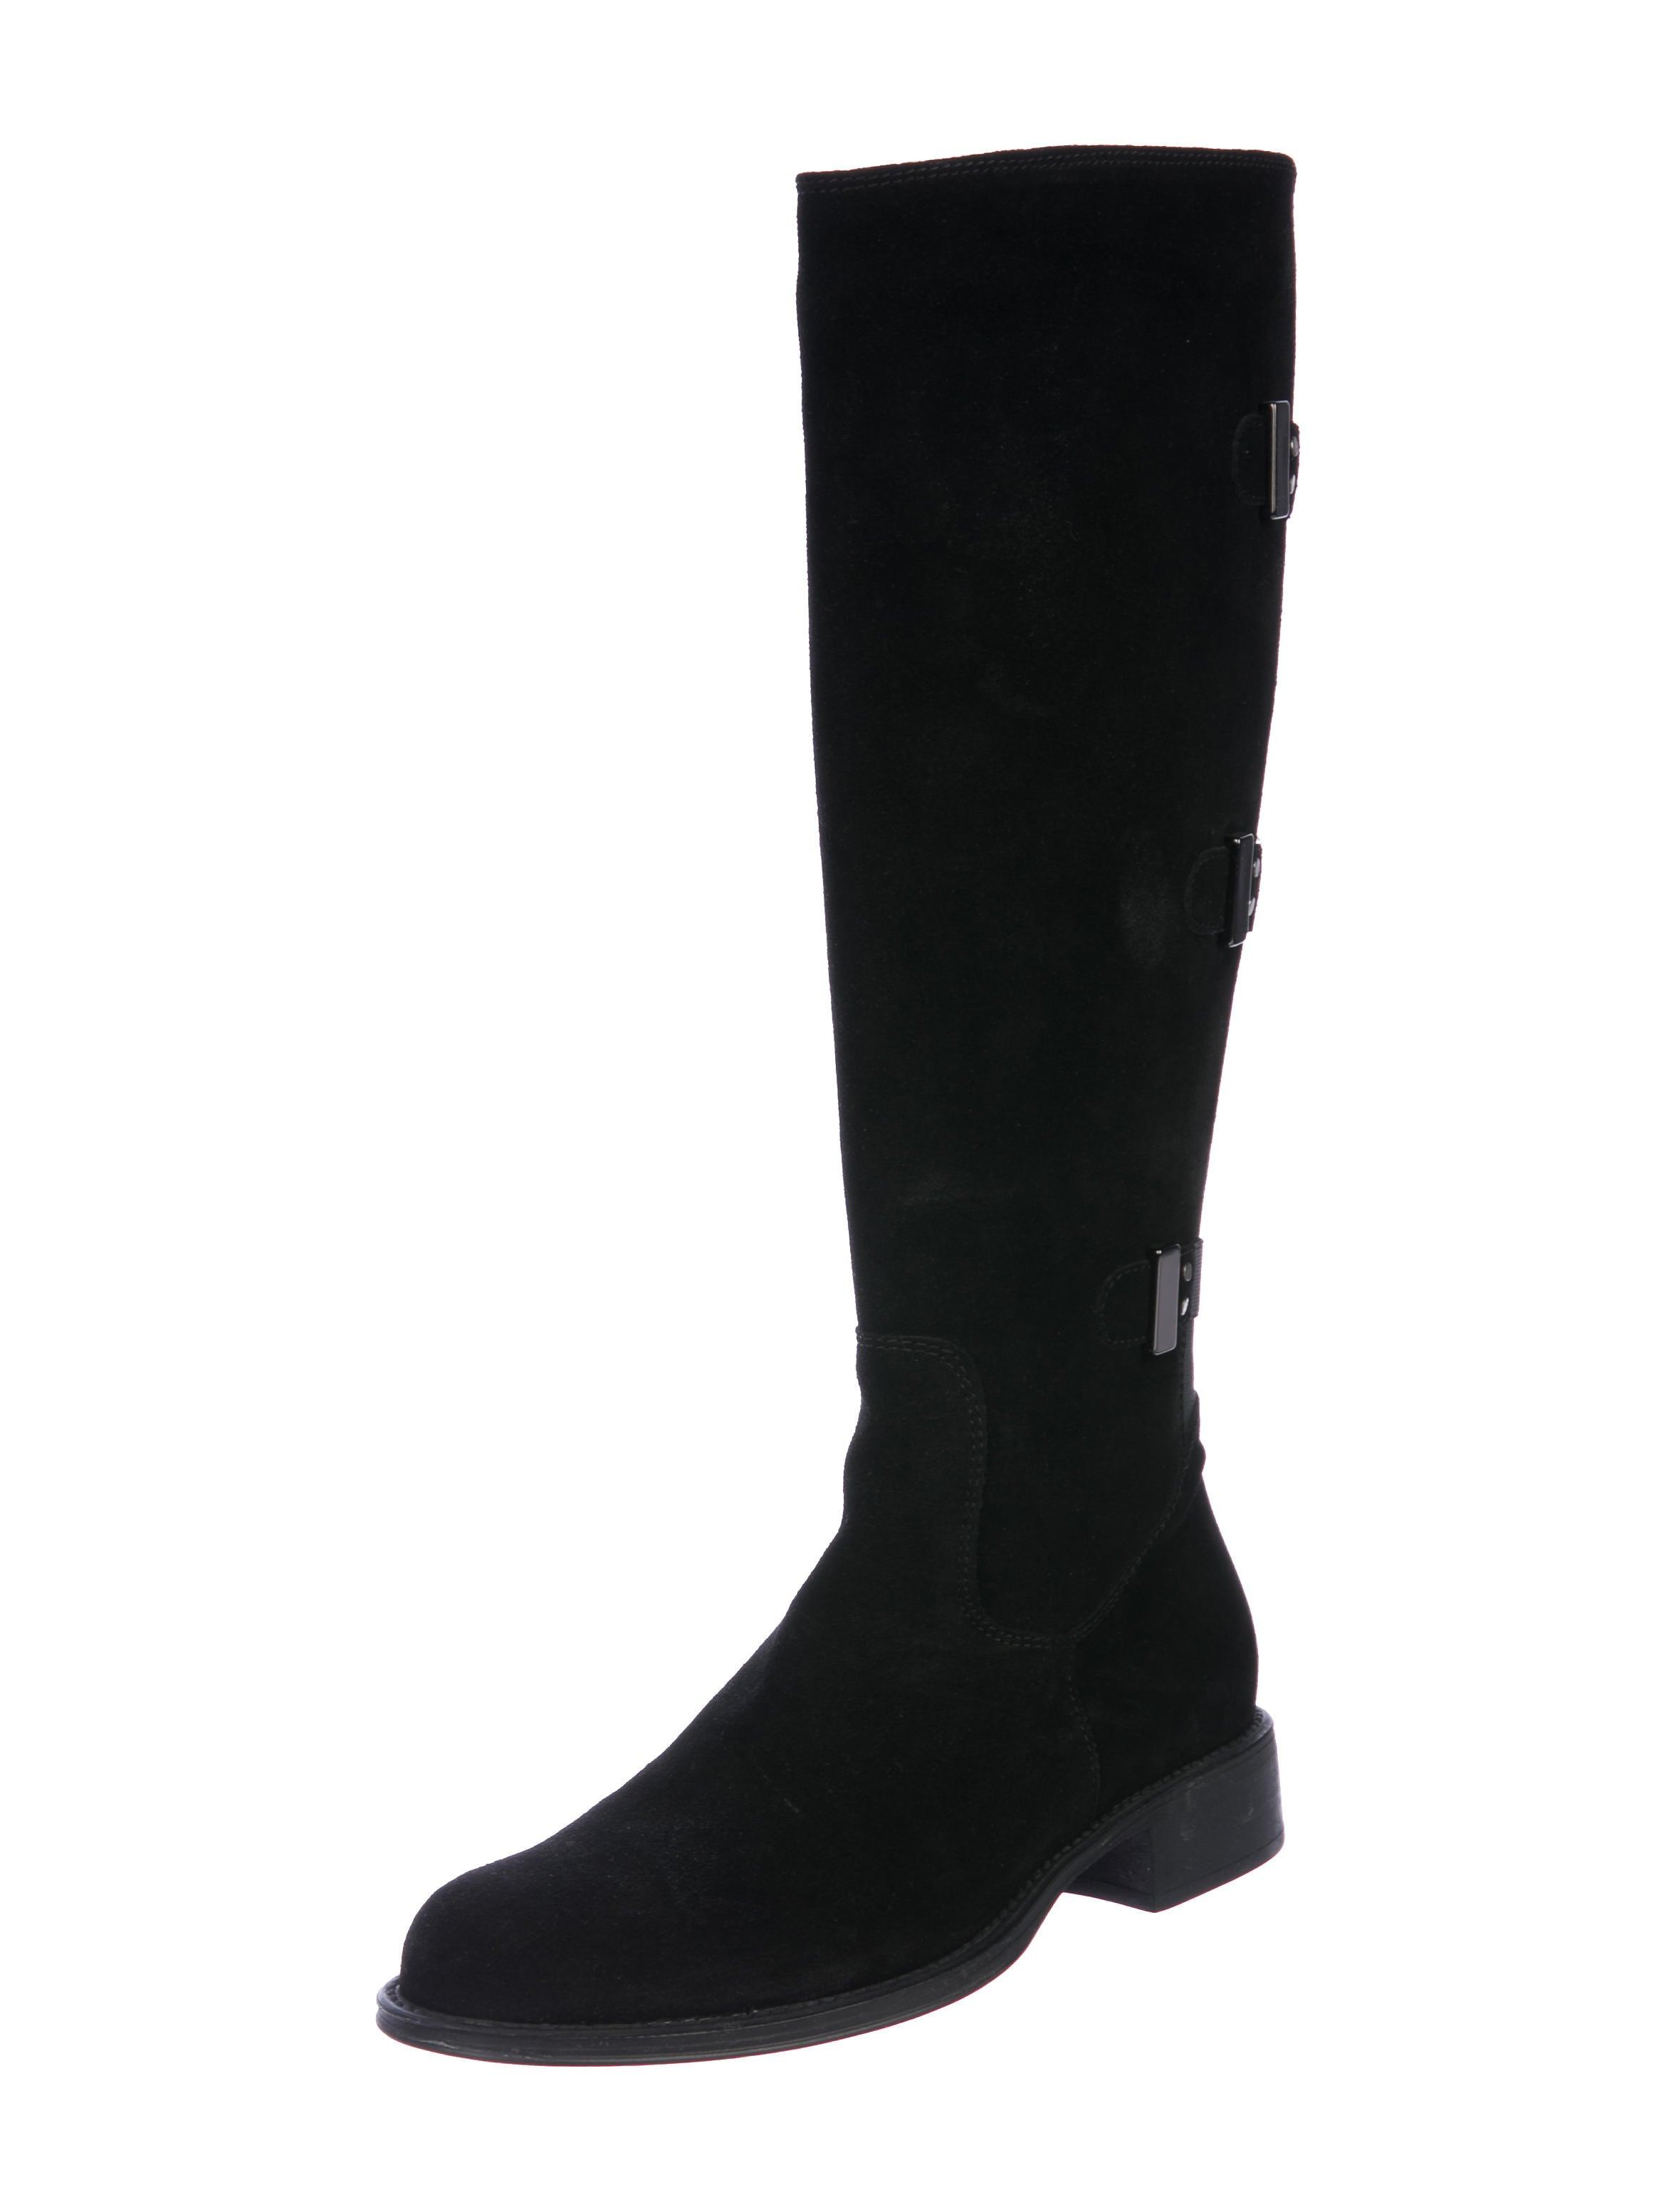 Aquatalia Unicorn Knee-High Boots w/ Tags best sale sale online cheap best place prices for sale sale original discount fake r1SDPe